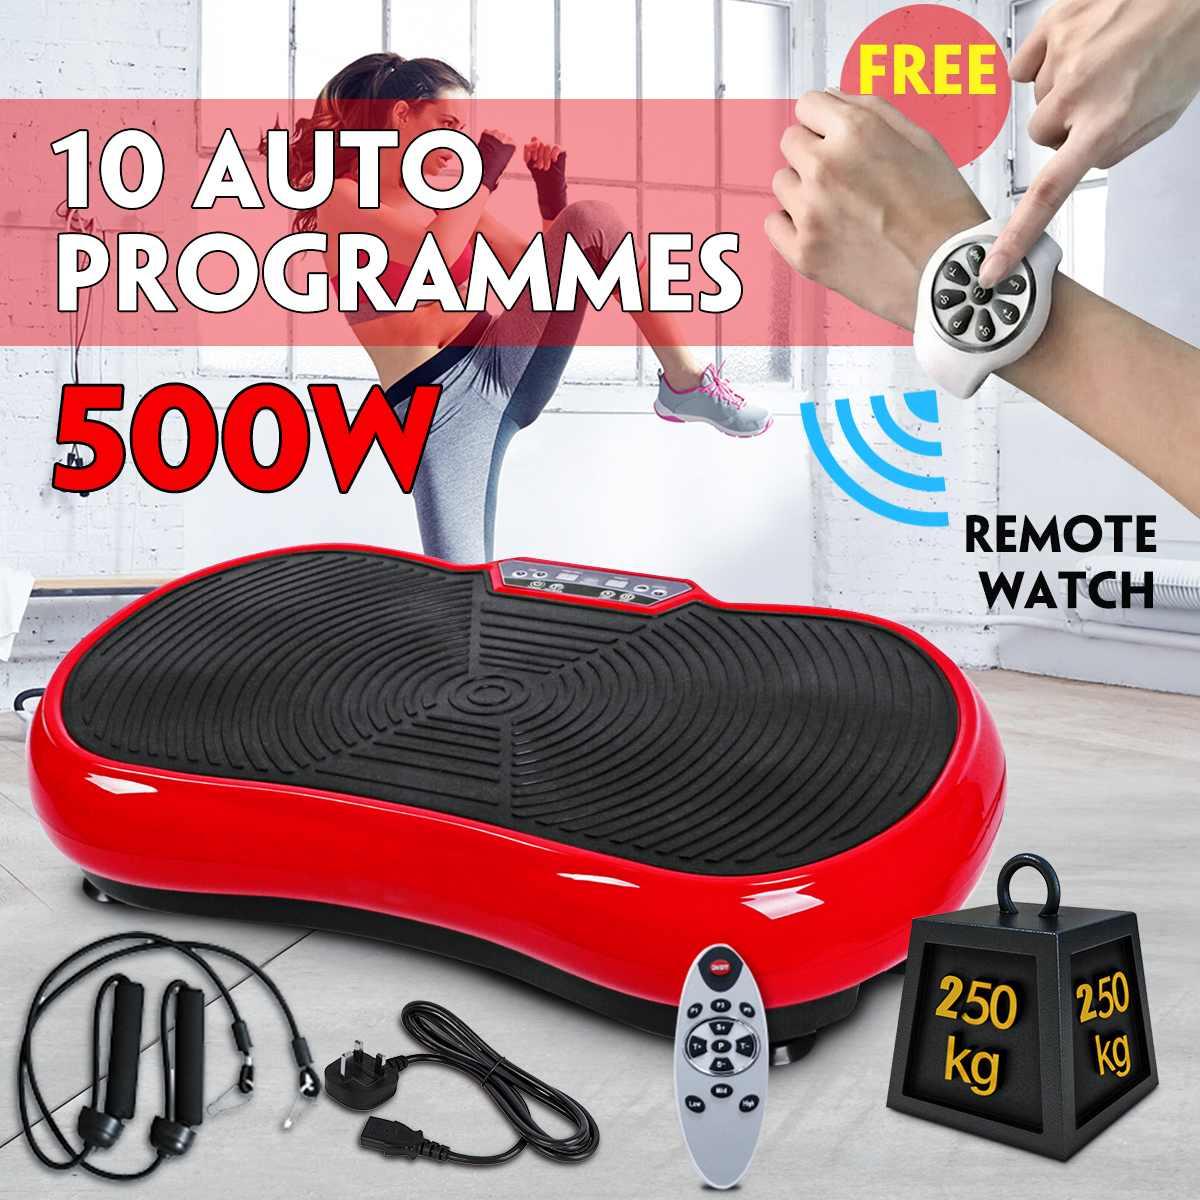 250KG 500W bluetooth Exercise Fitness Slim Vibration Machine + Remote Watch Trainer Plate Platform Body Shaper+Resistance Band